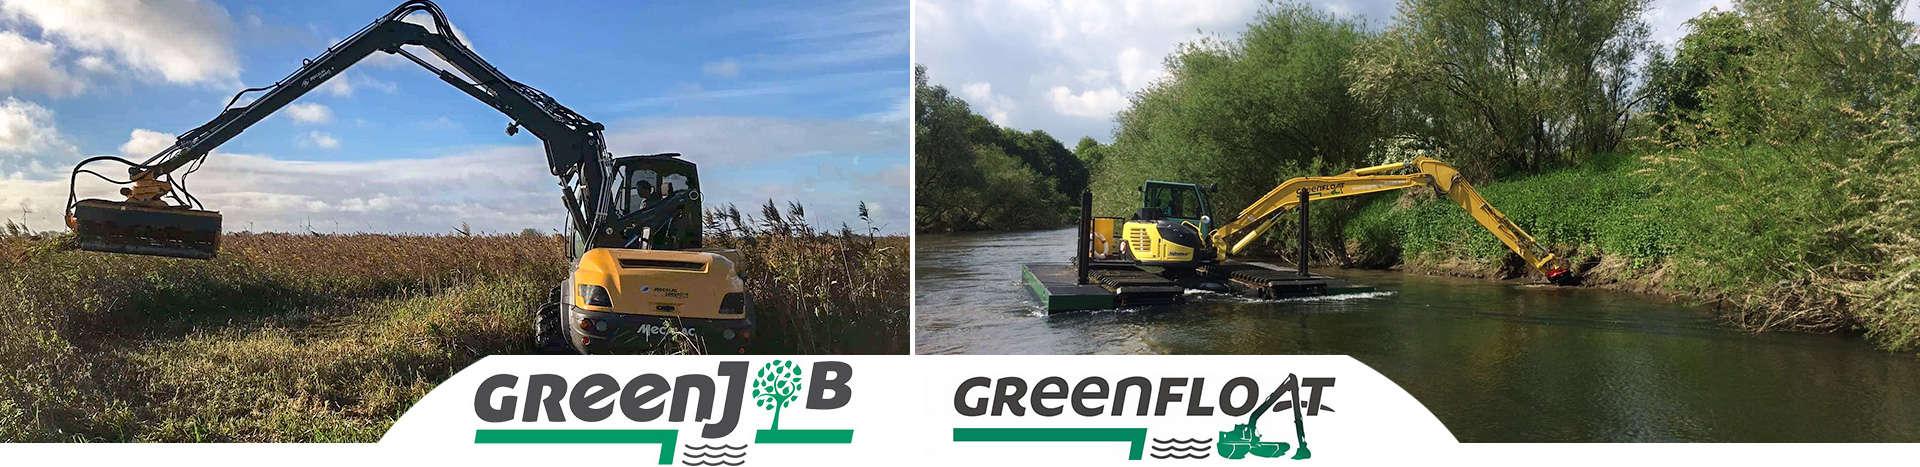 GreenJob & Greenfloat. MBN GreenLine